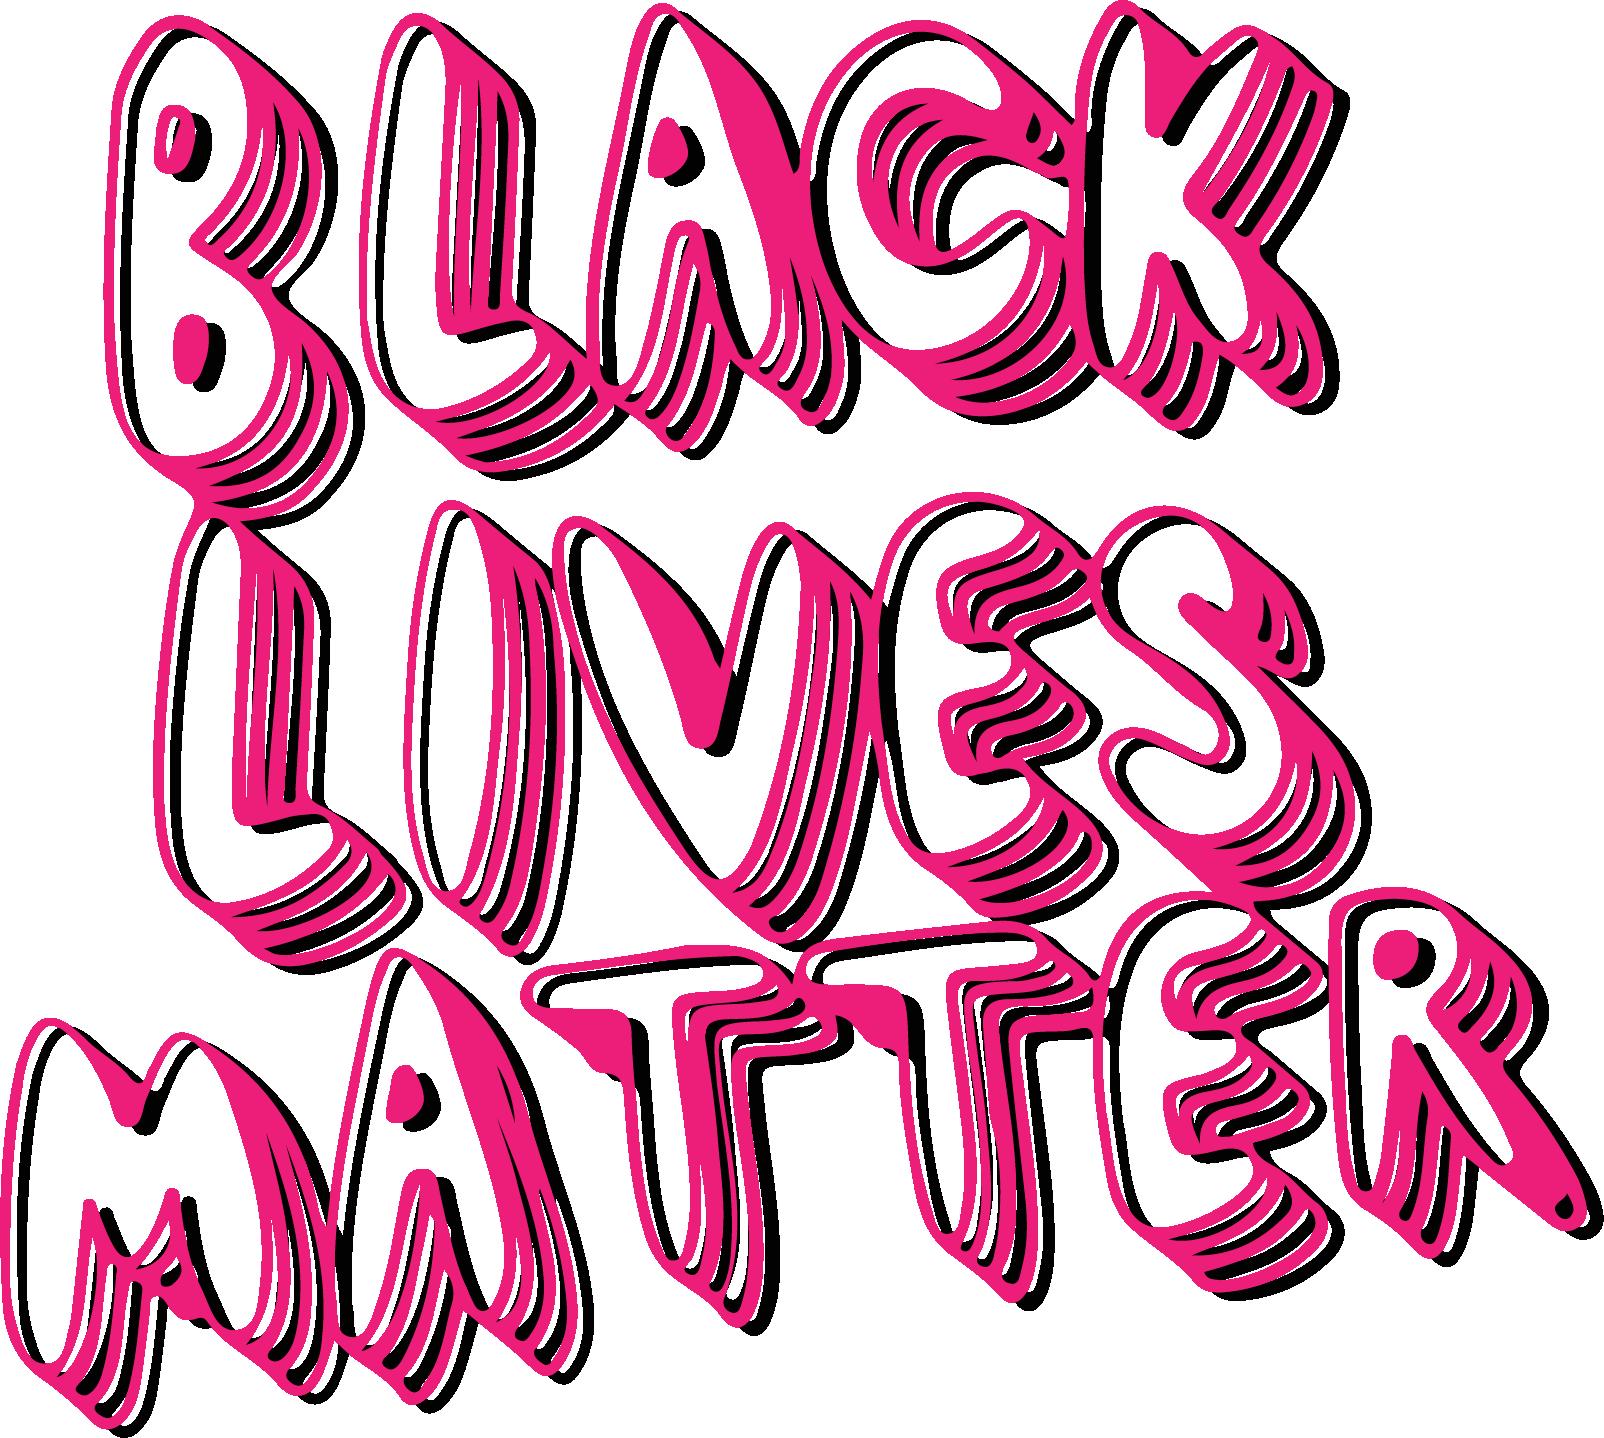 Black lives also matters color